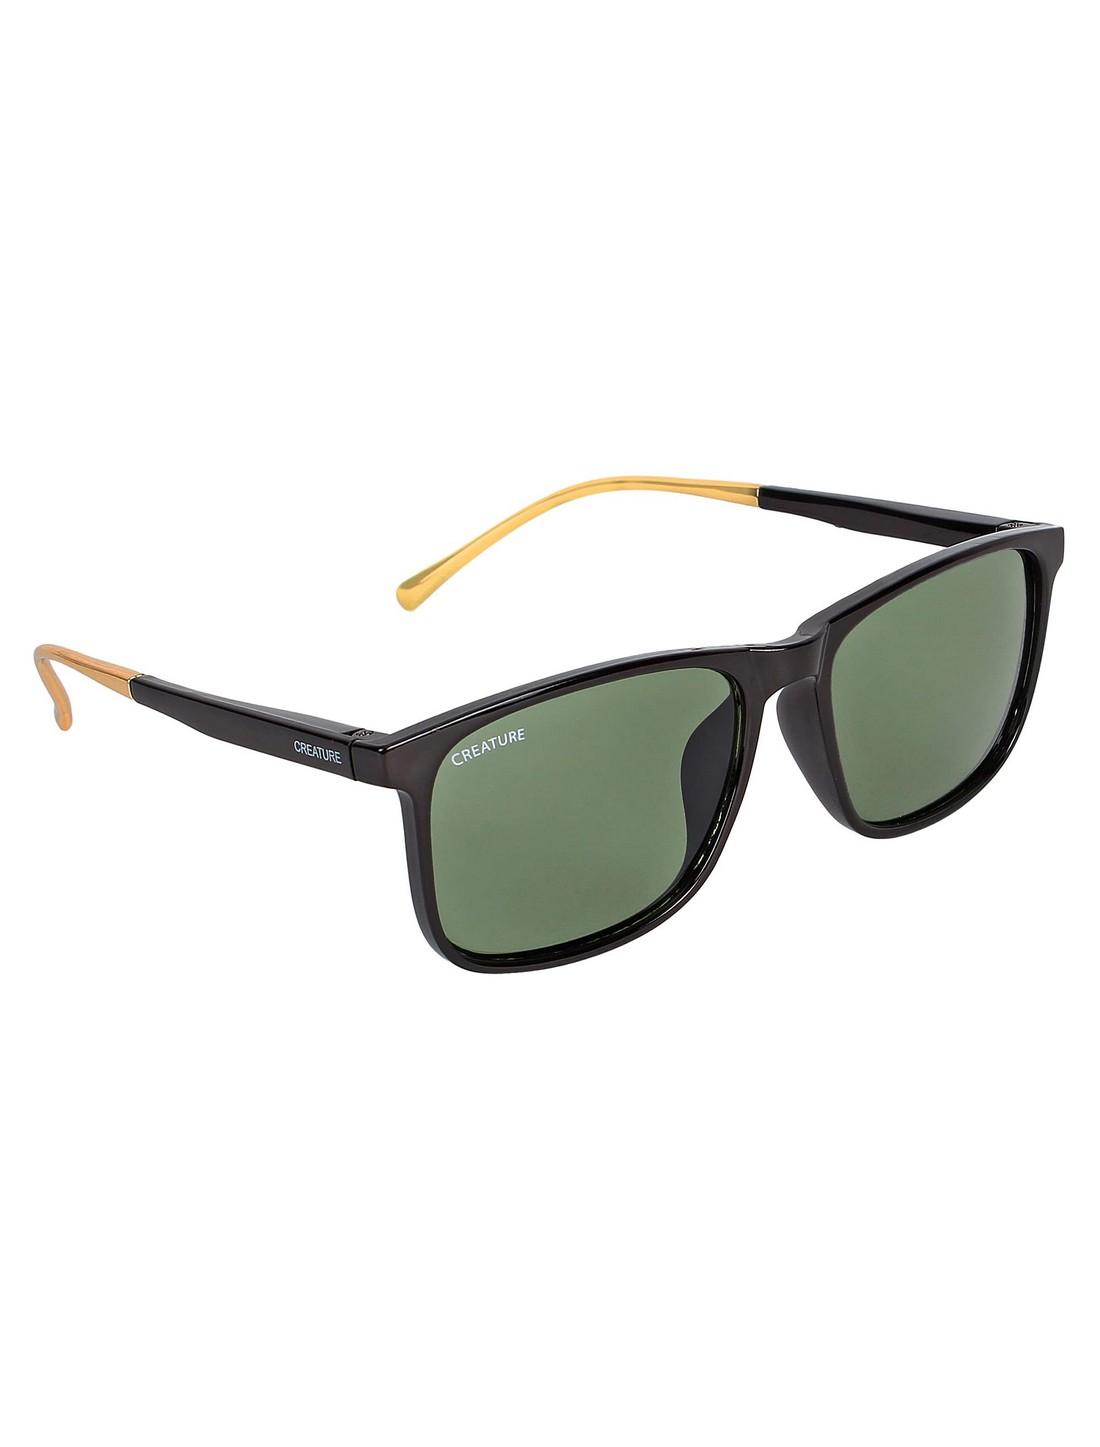 CREATURE   Creature Gloss Finish Rectangular UV Protected Unisex Sunglasses